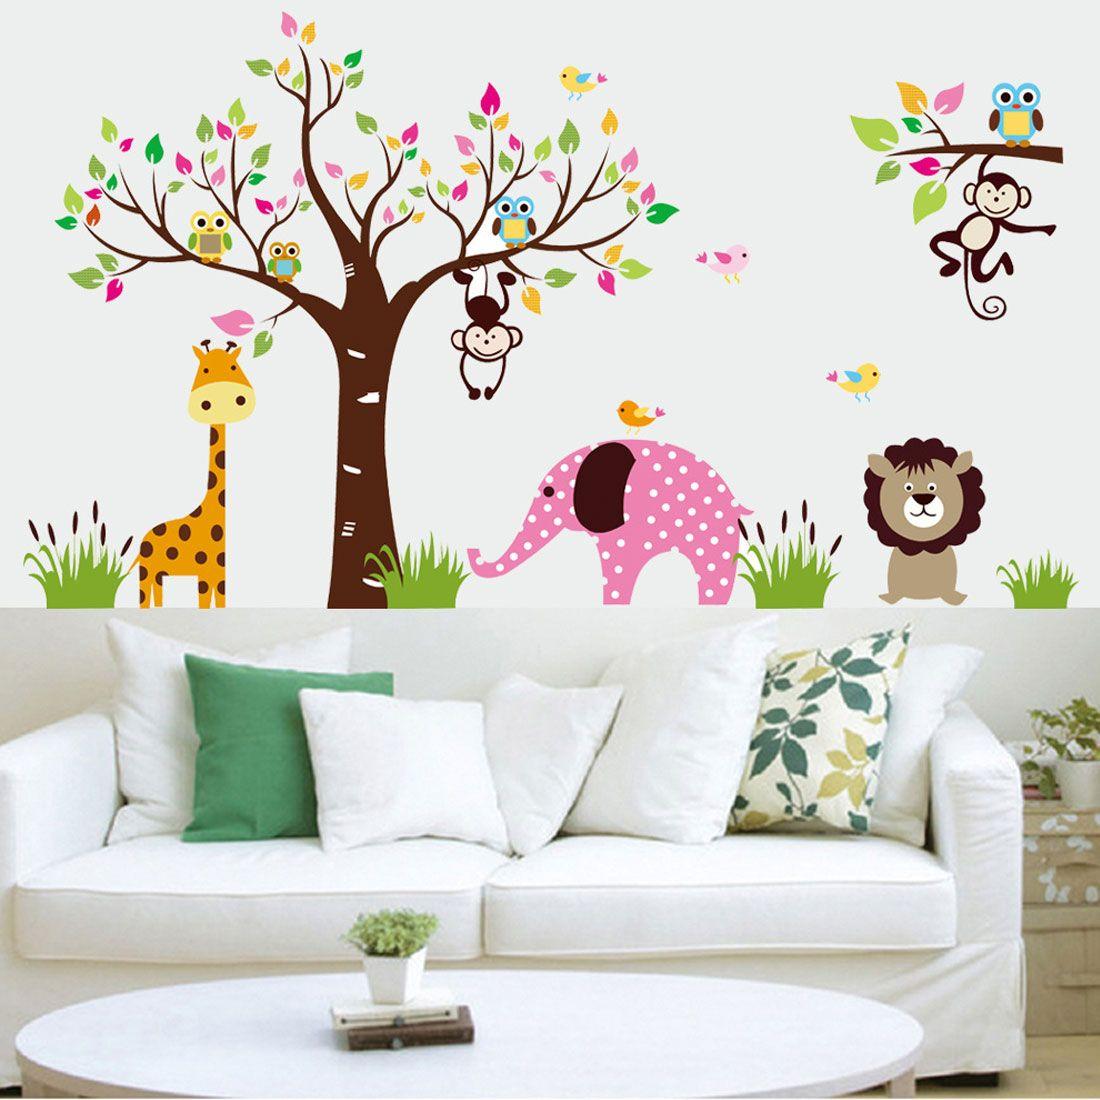 wall stickers sri lanka wall stickers sri lanka animals and tree cartoon wallpaper wall stickers kindergarten and kids room